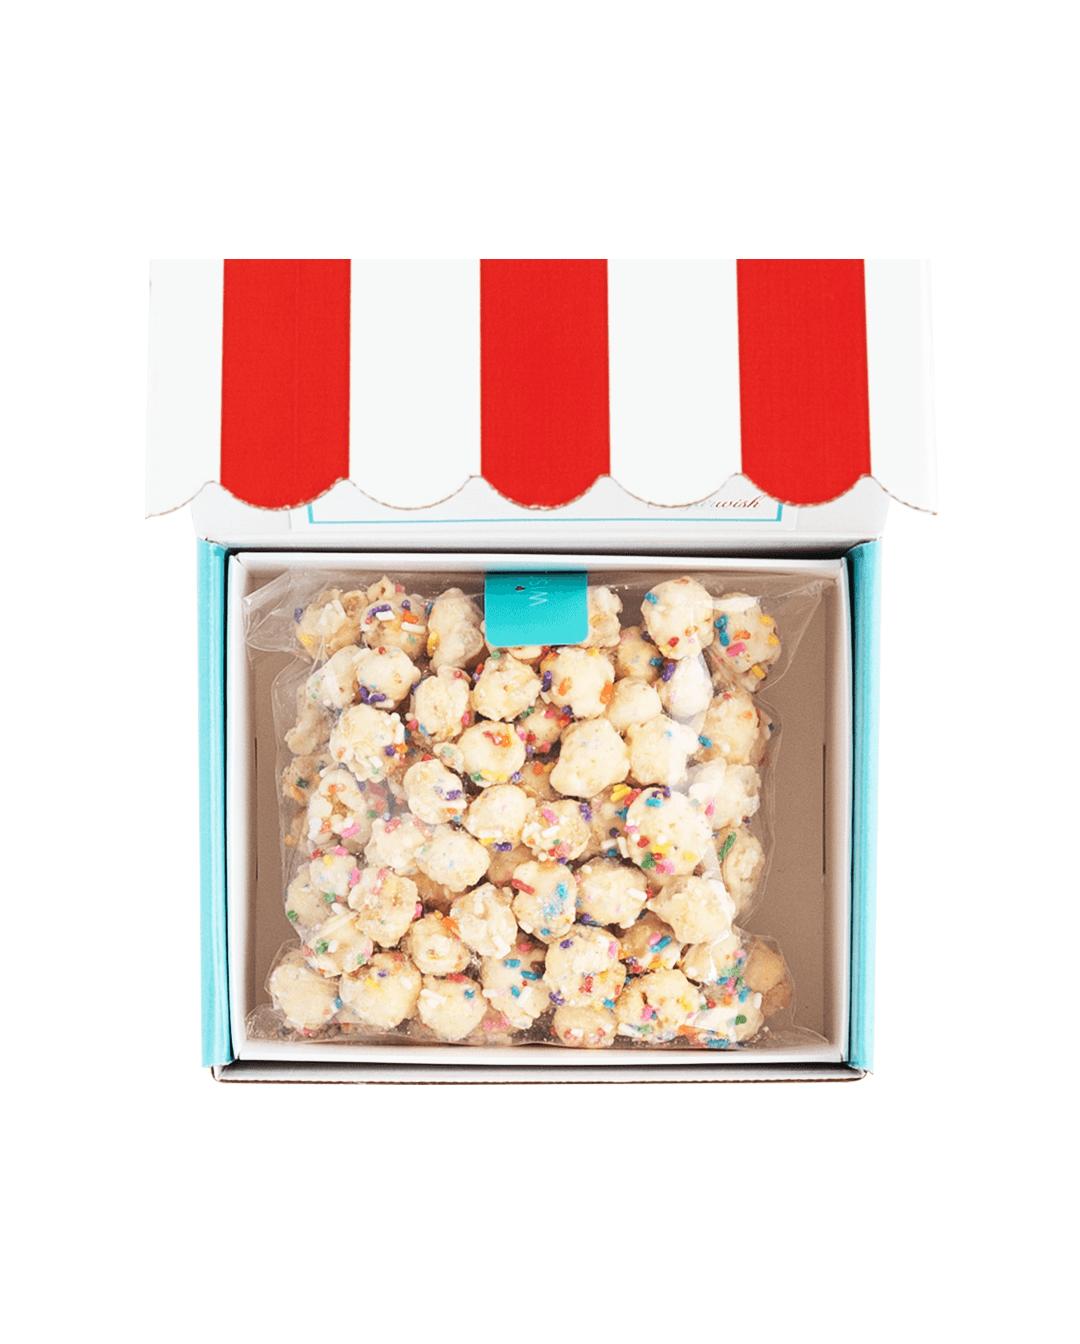 1 pick popcorn image